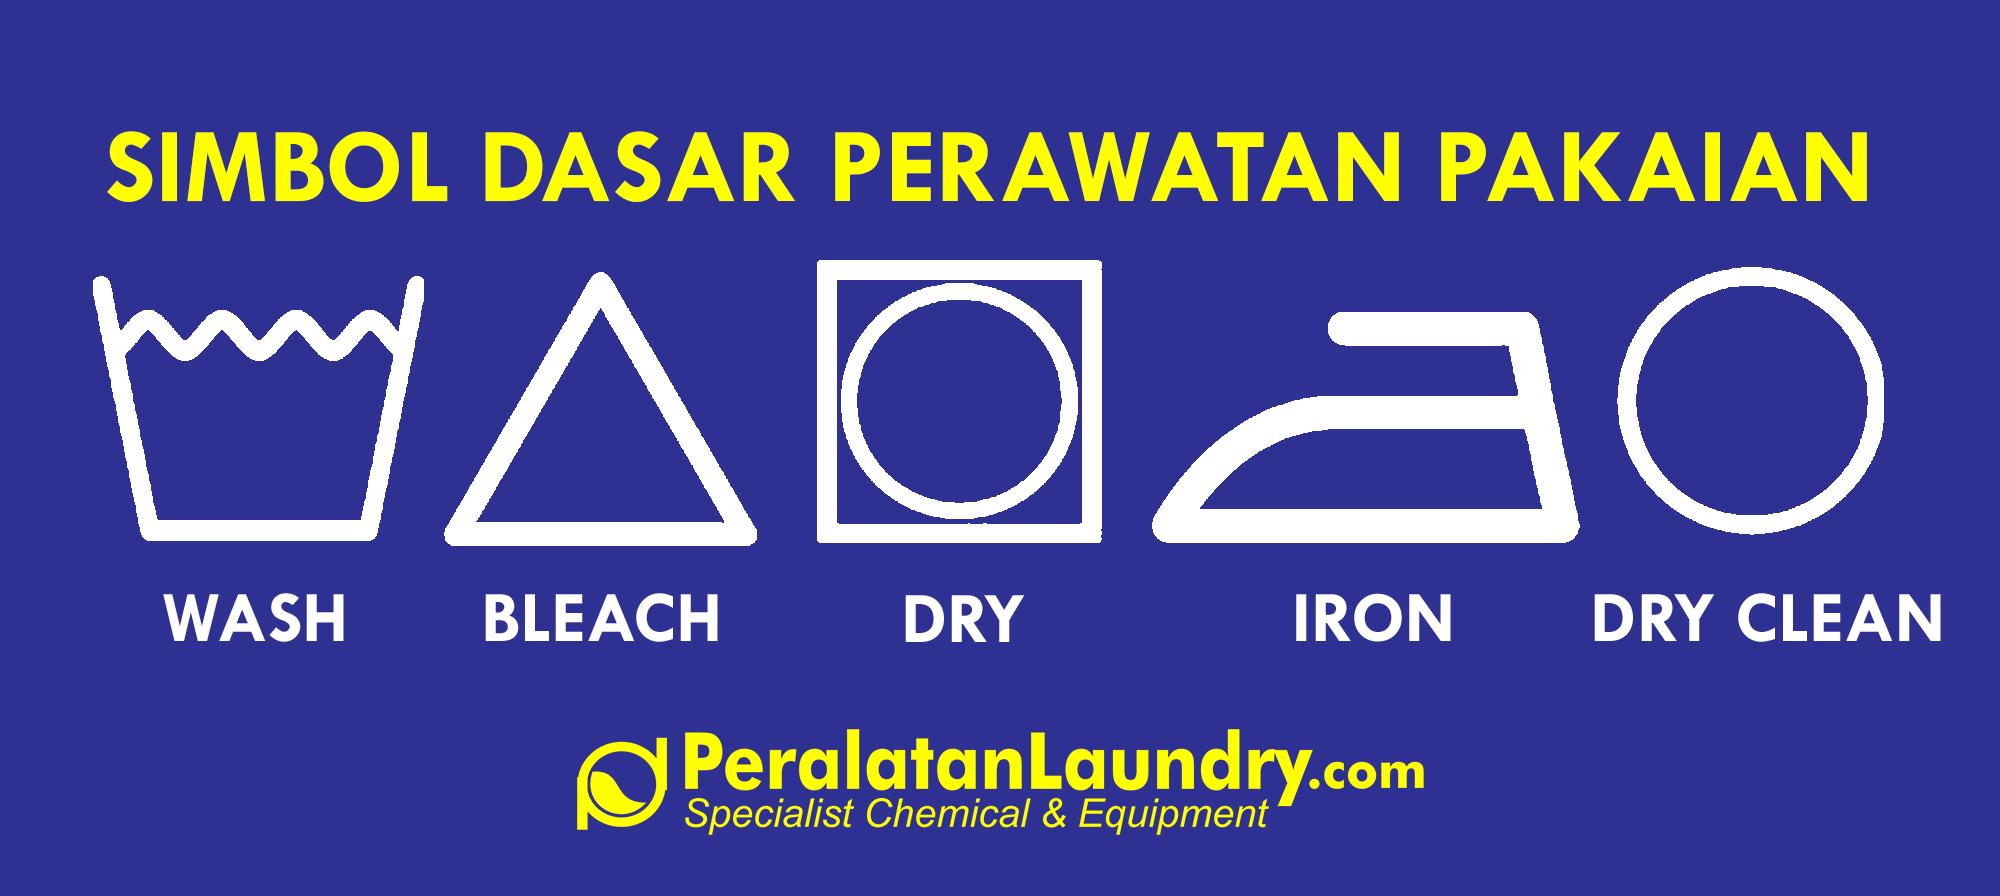 simbol pakaian